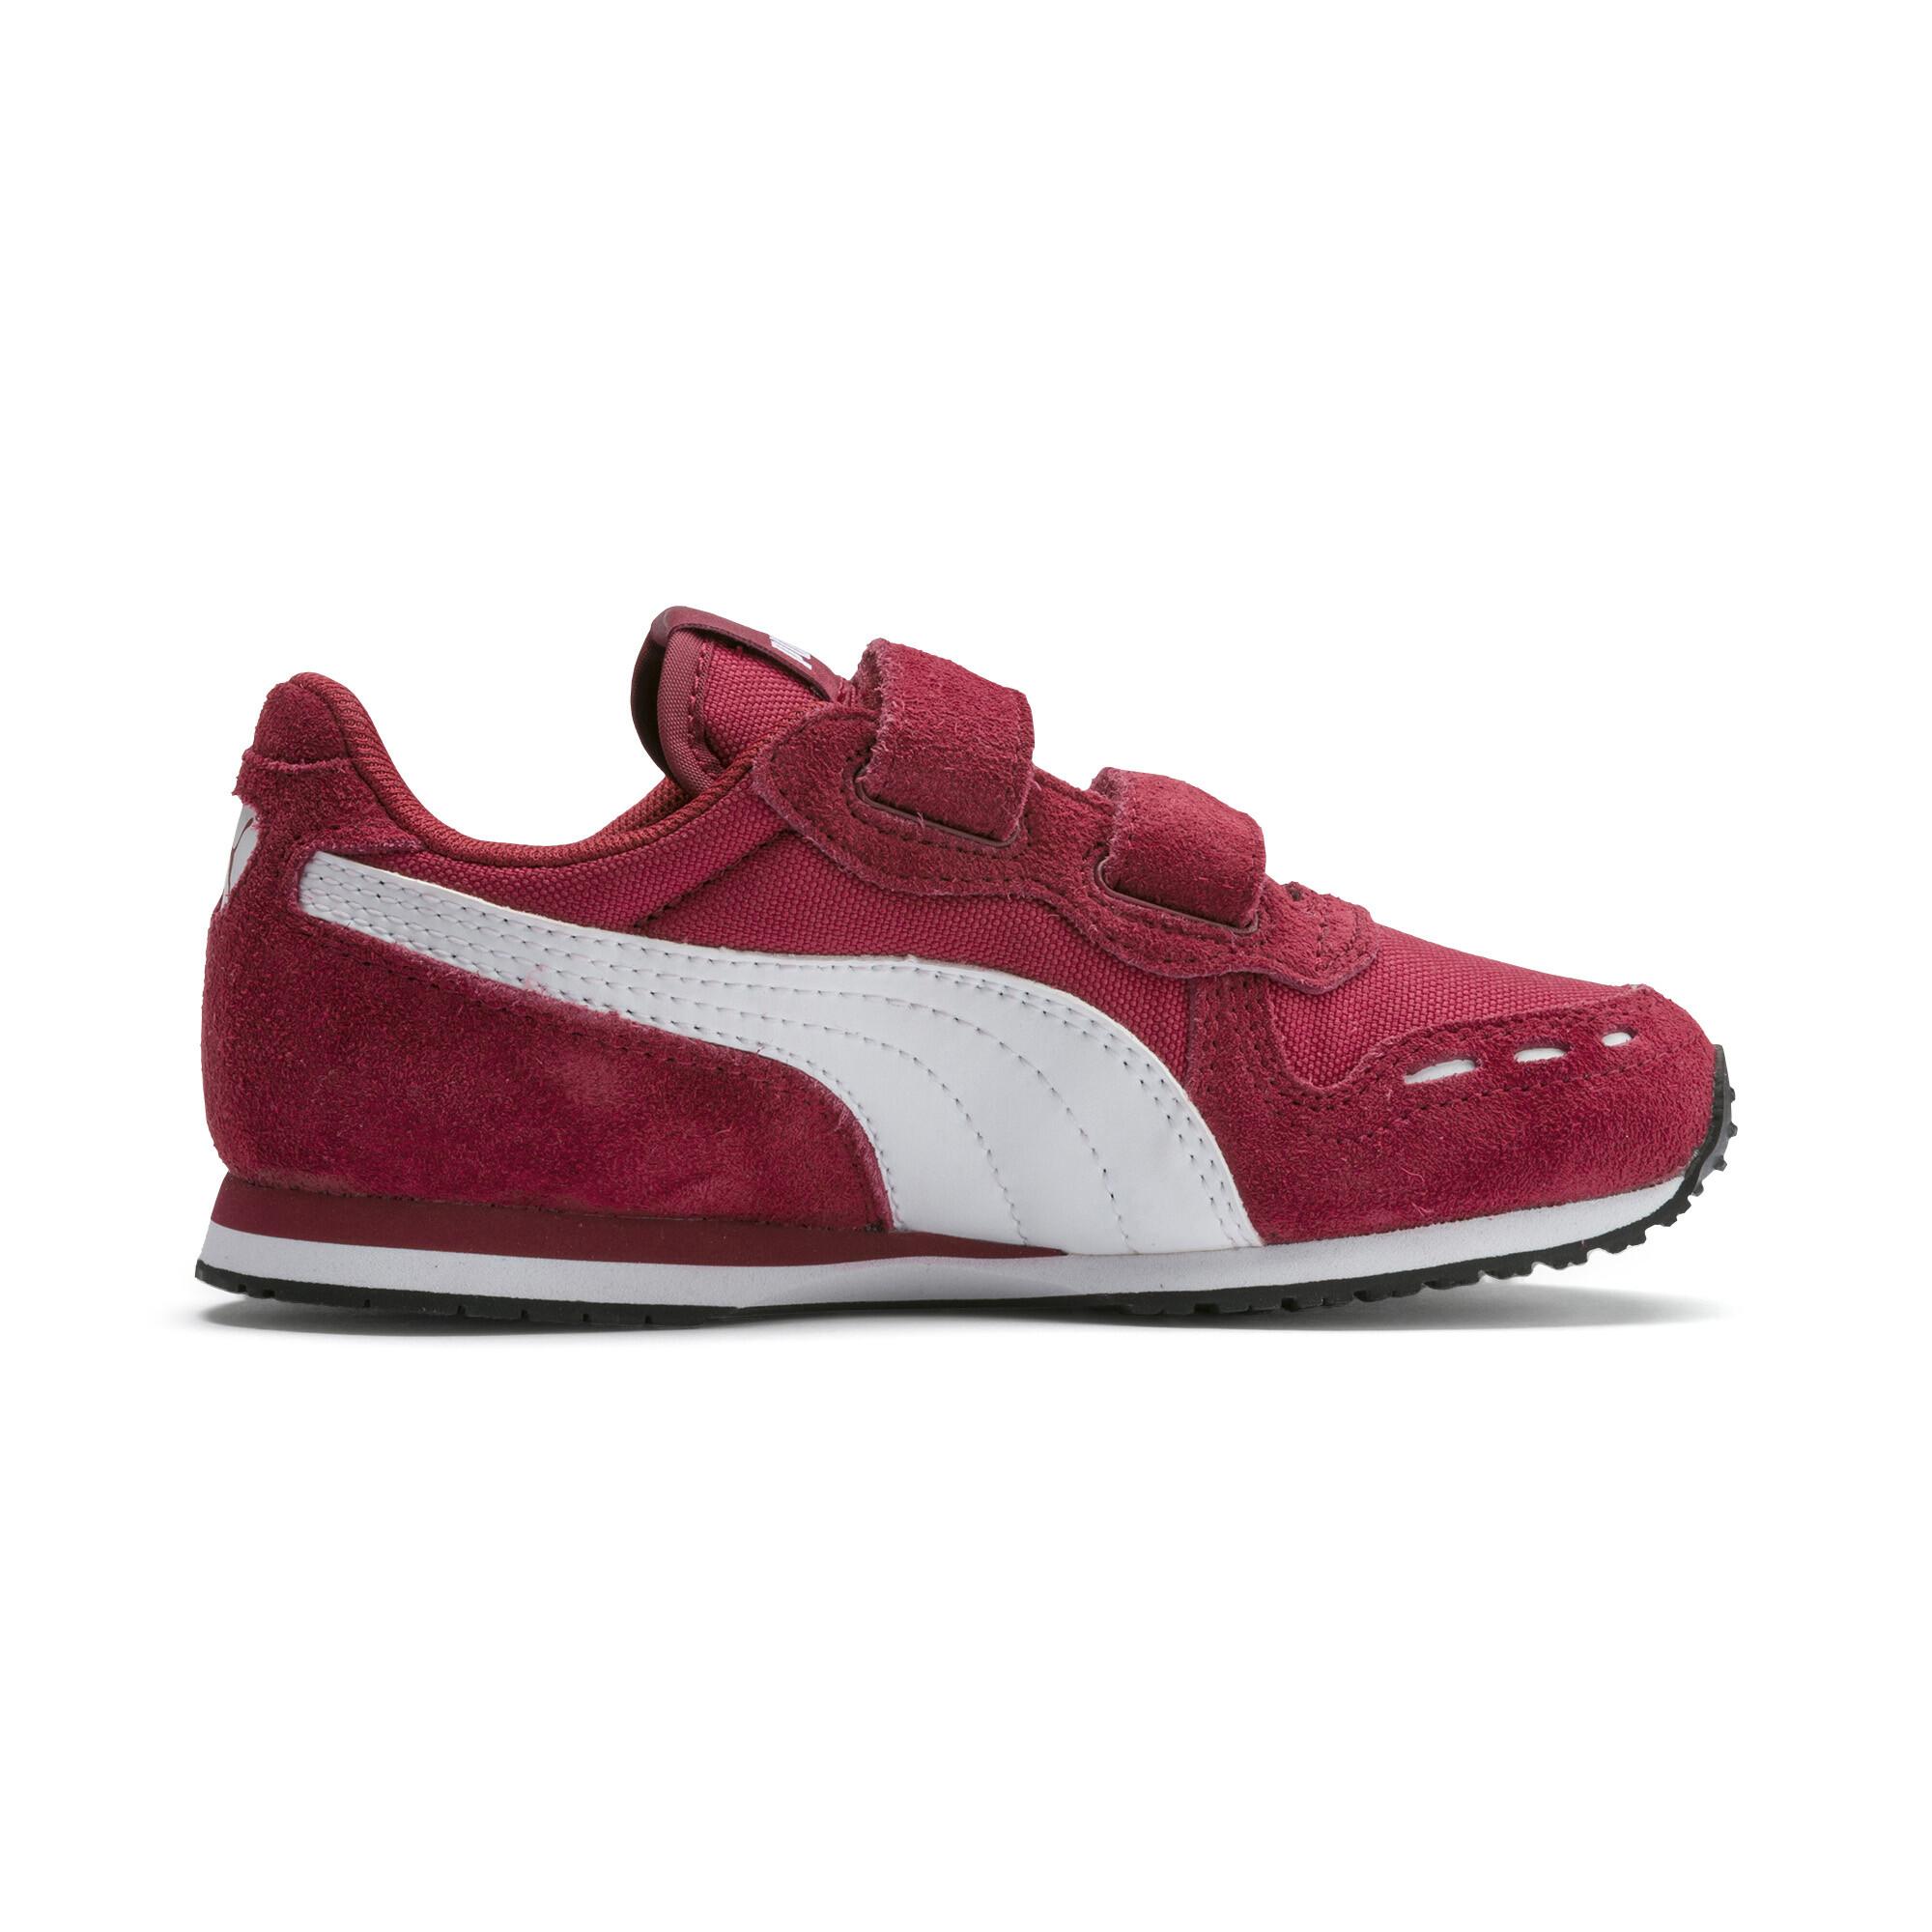 PUMA-Cabana-Racer-Little-Kids-039-Shoes-Kids-Shoe-Kids thumbnail 6